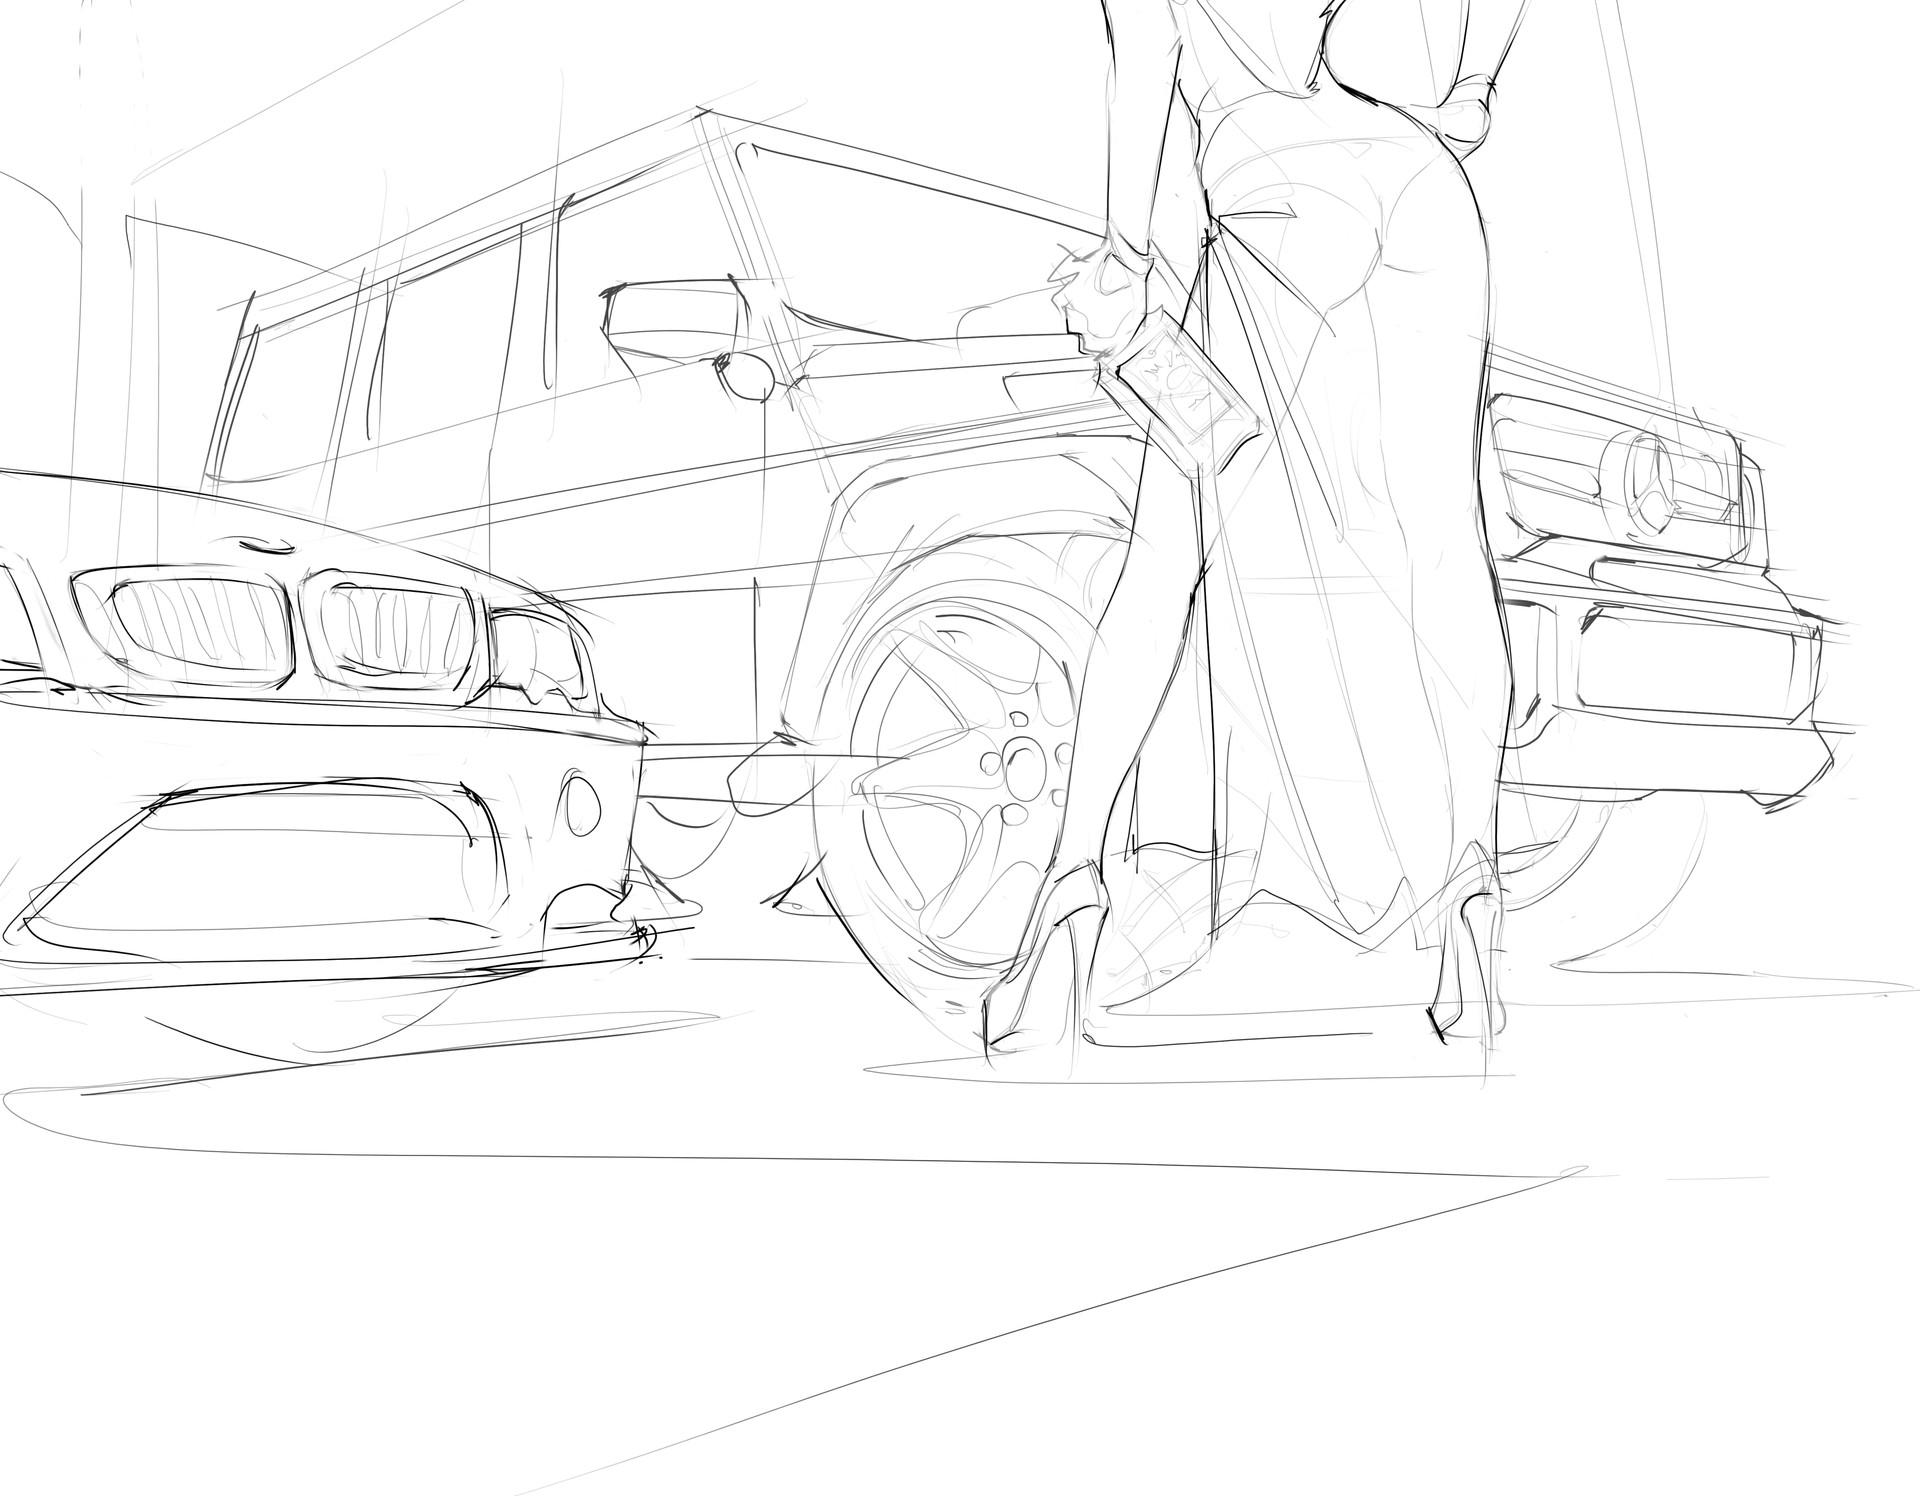 car accident drawing at getdrawings com